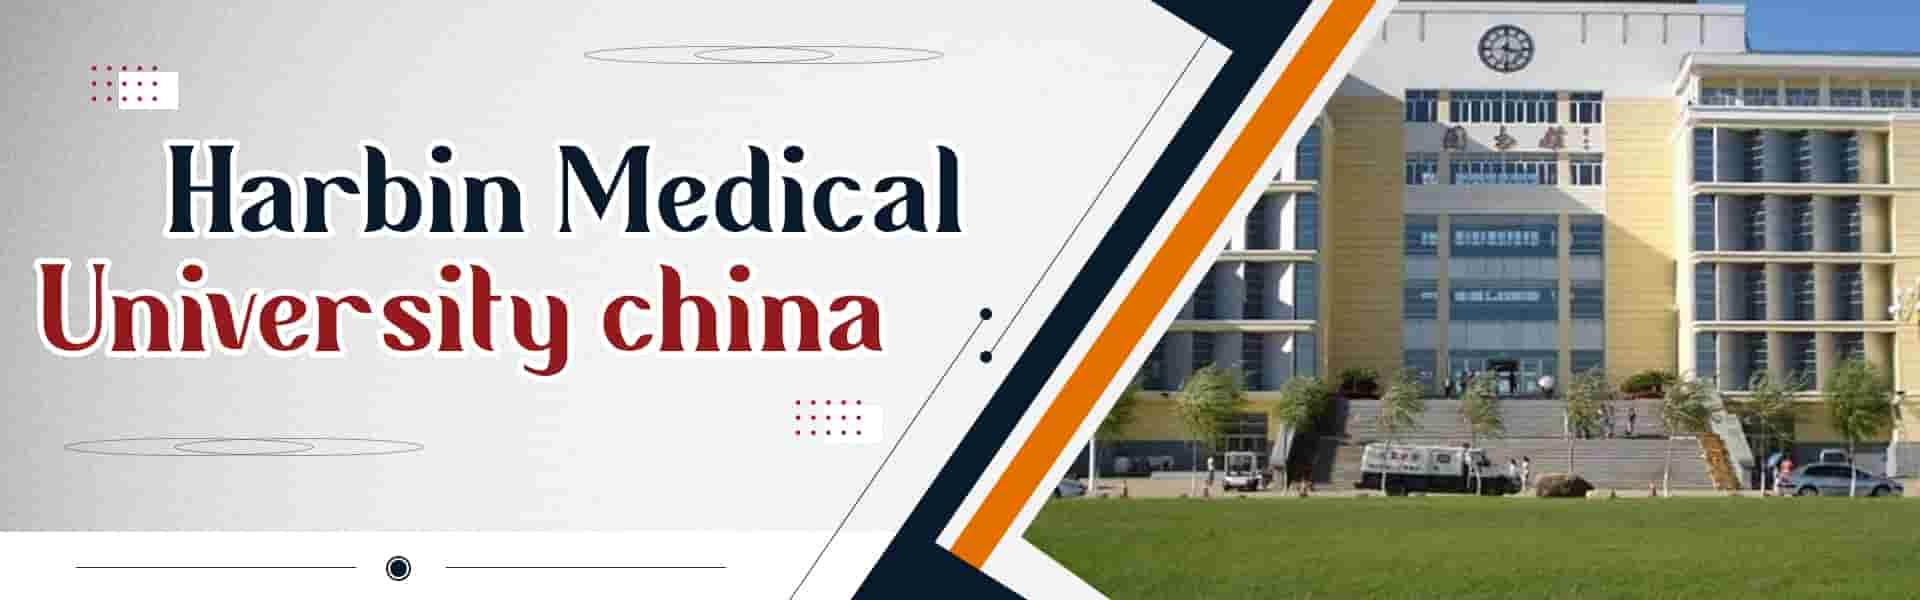 Harbin Medical University (HMU China)